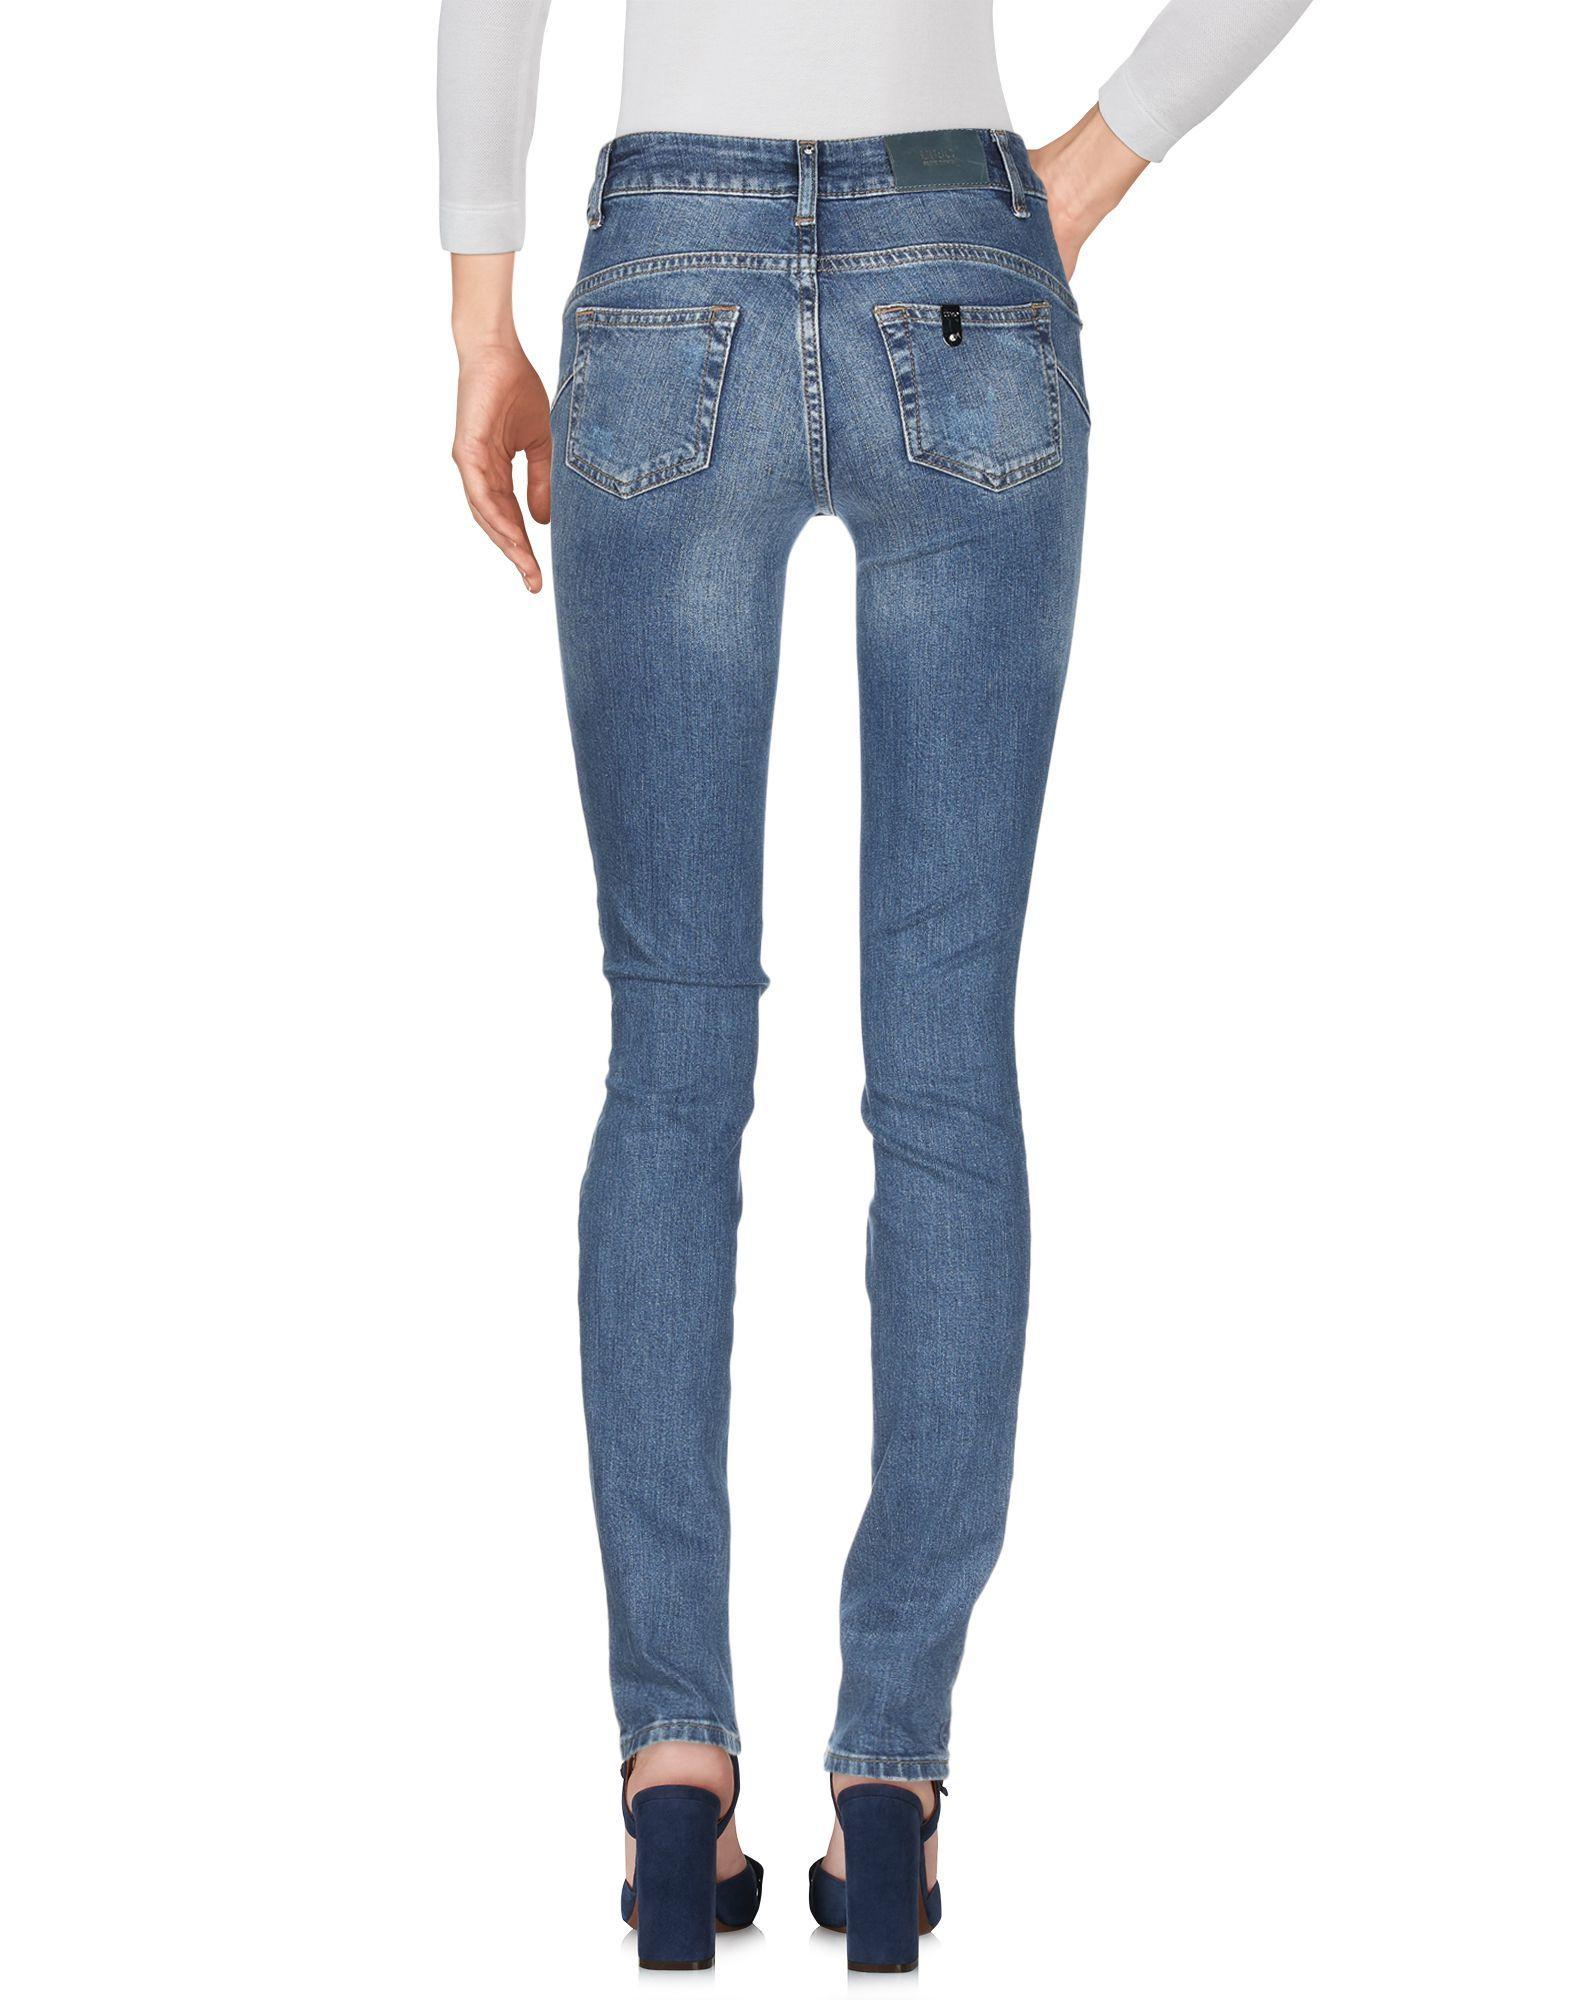 Liu Jo Blue Cotton Jeans